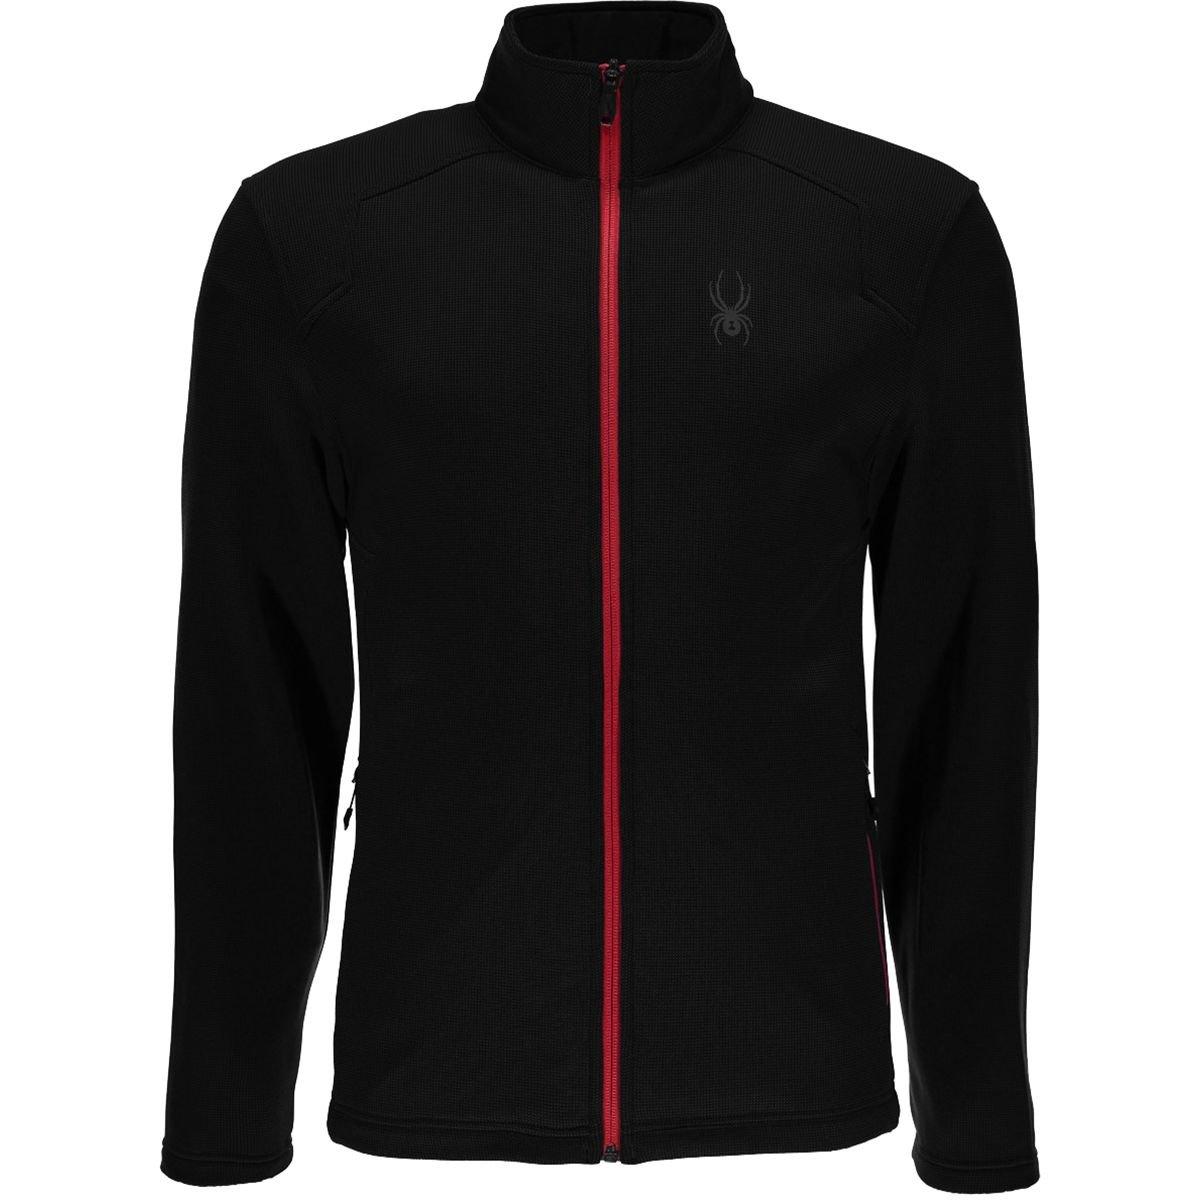 Spyder Chambers Full Zip Jacket – Men 's B077J2GQF8 Large|ブラック ブラック Large